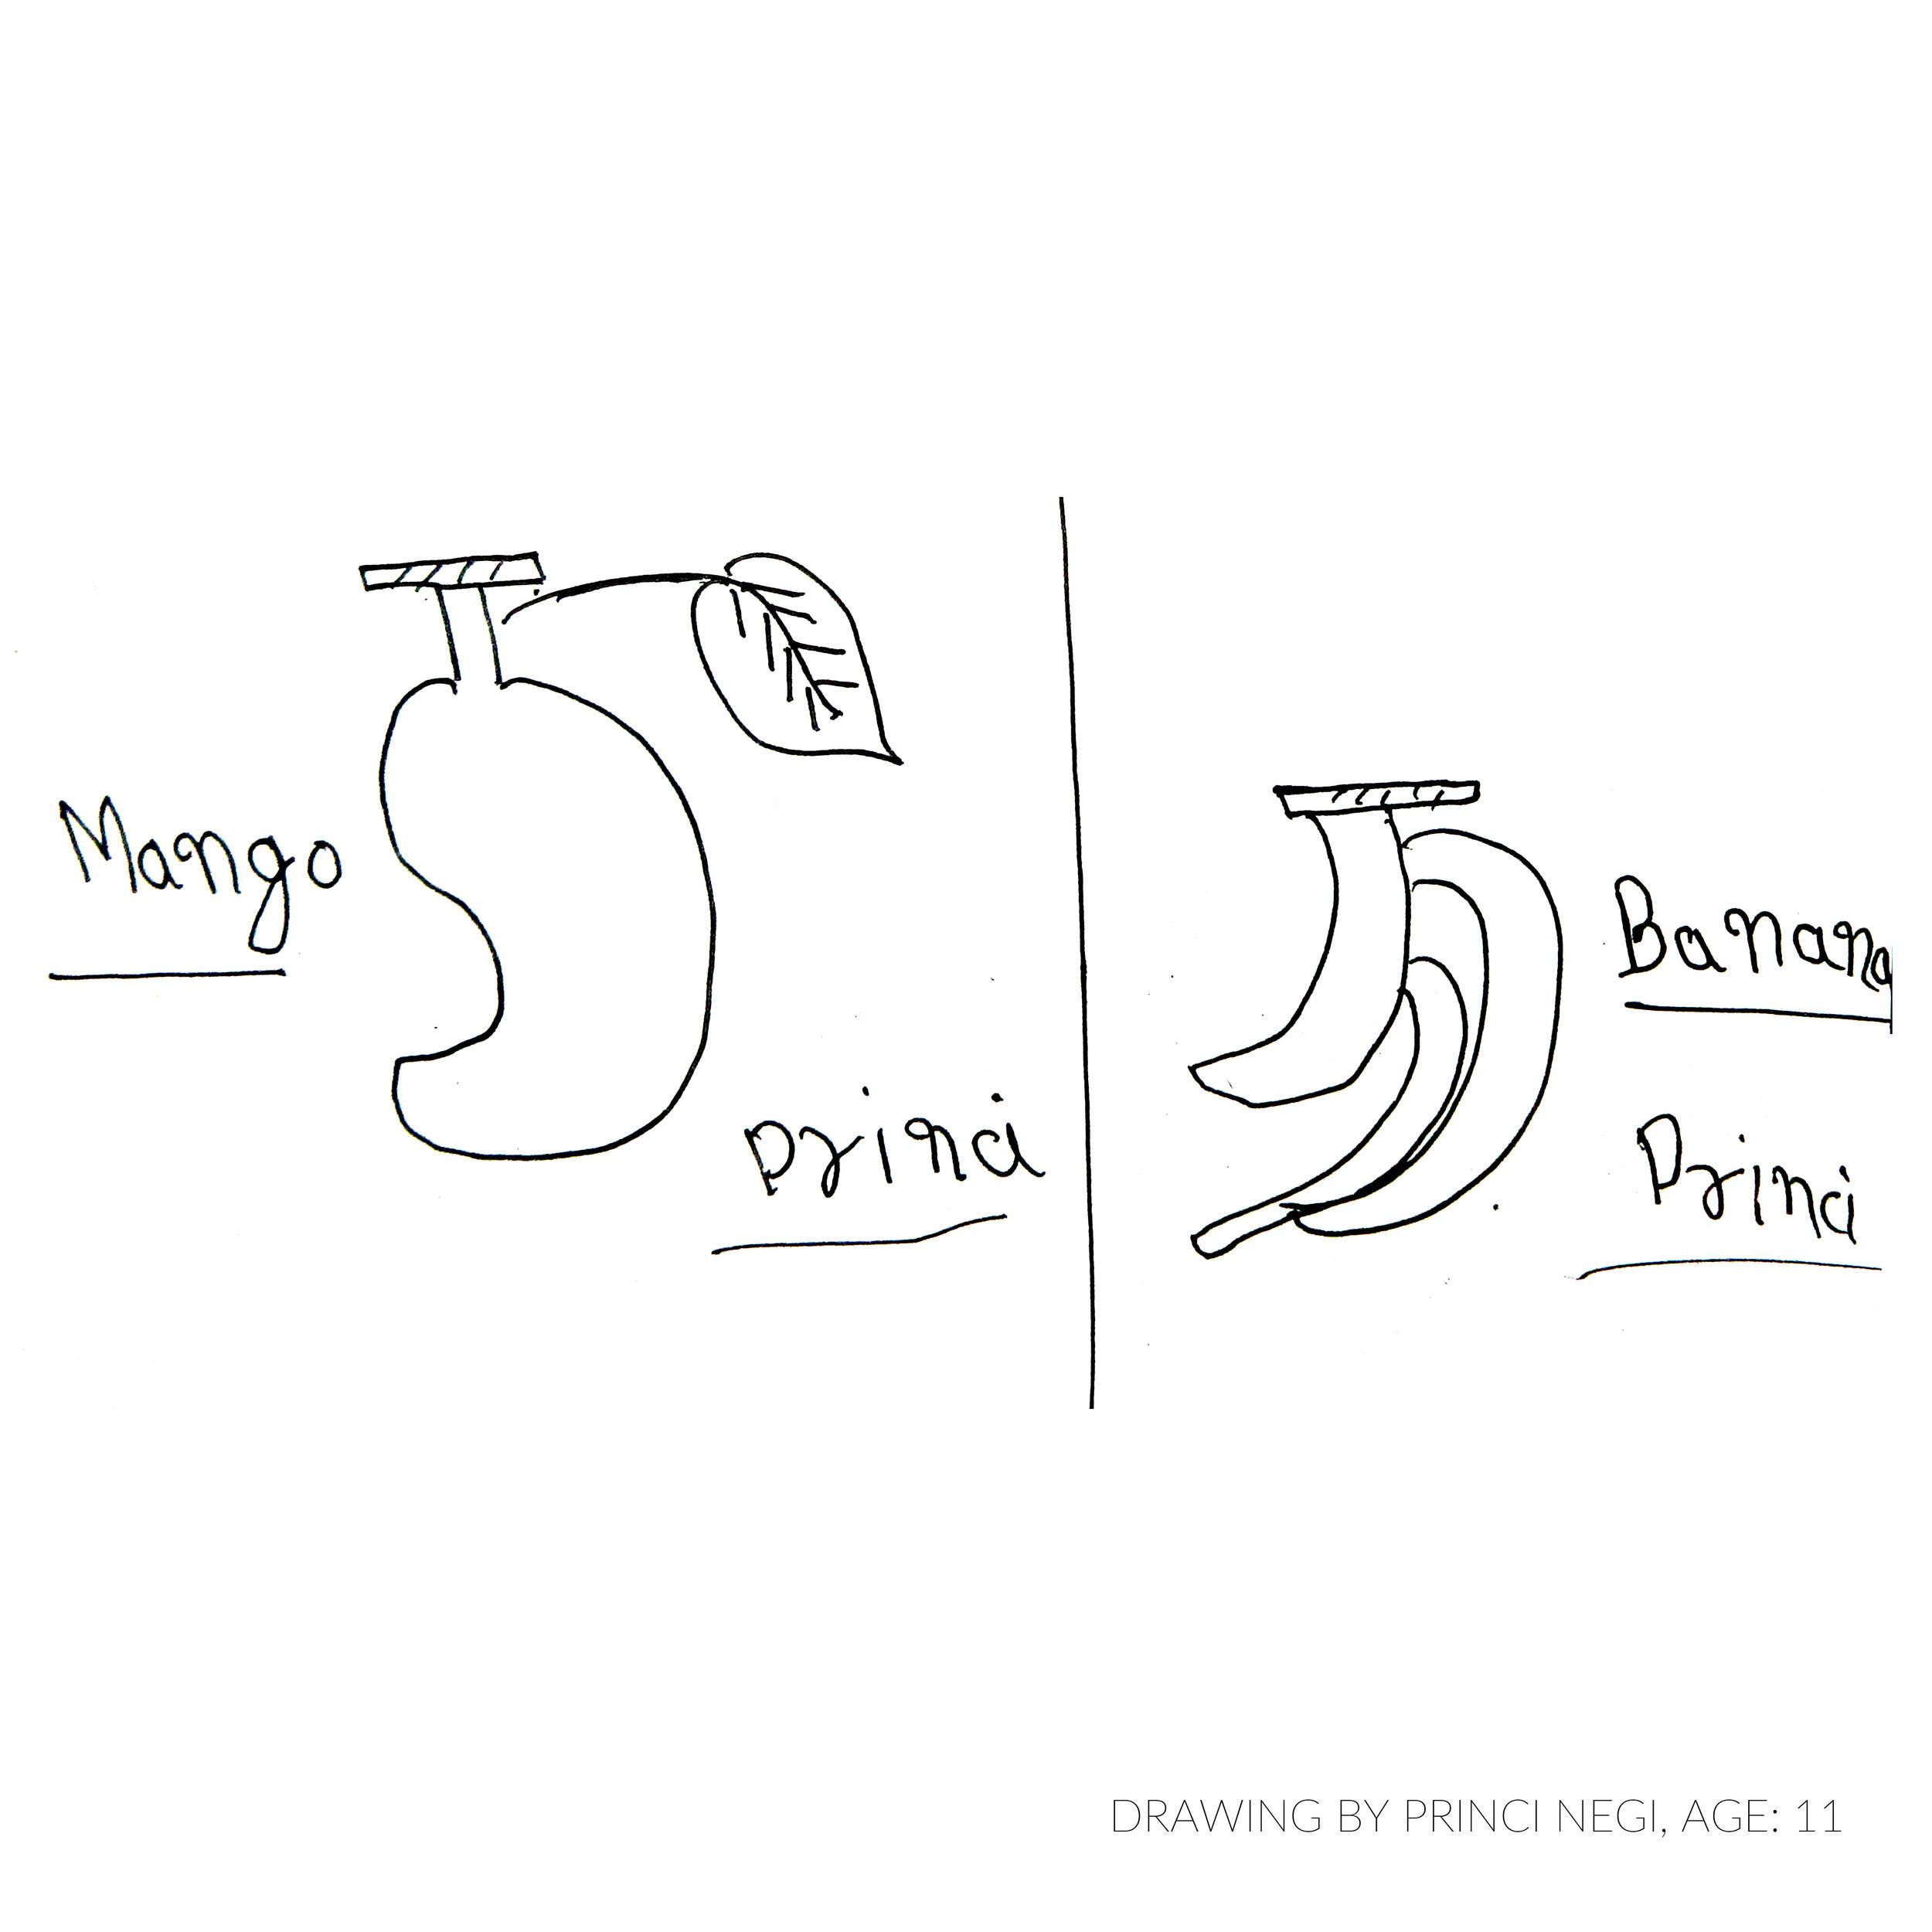 Drawing by Princi, age 11